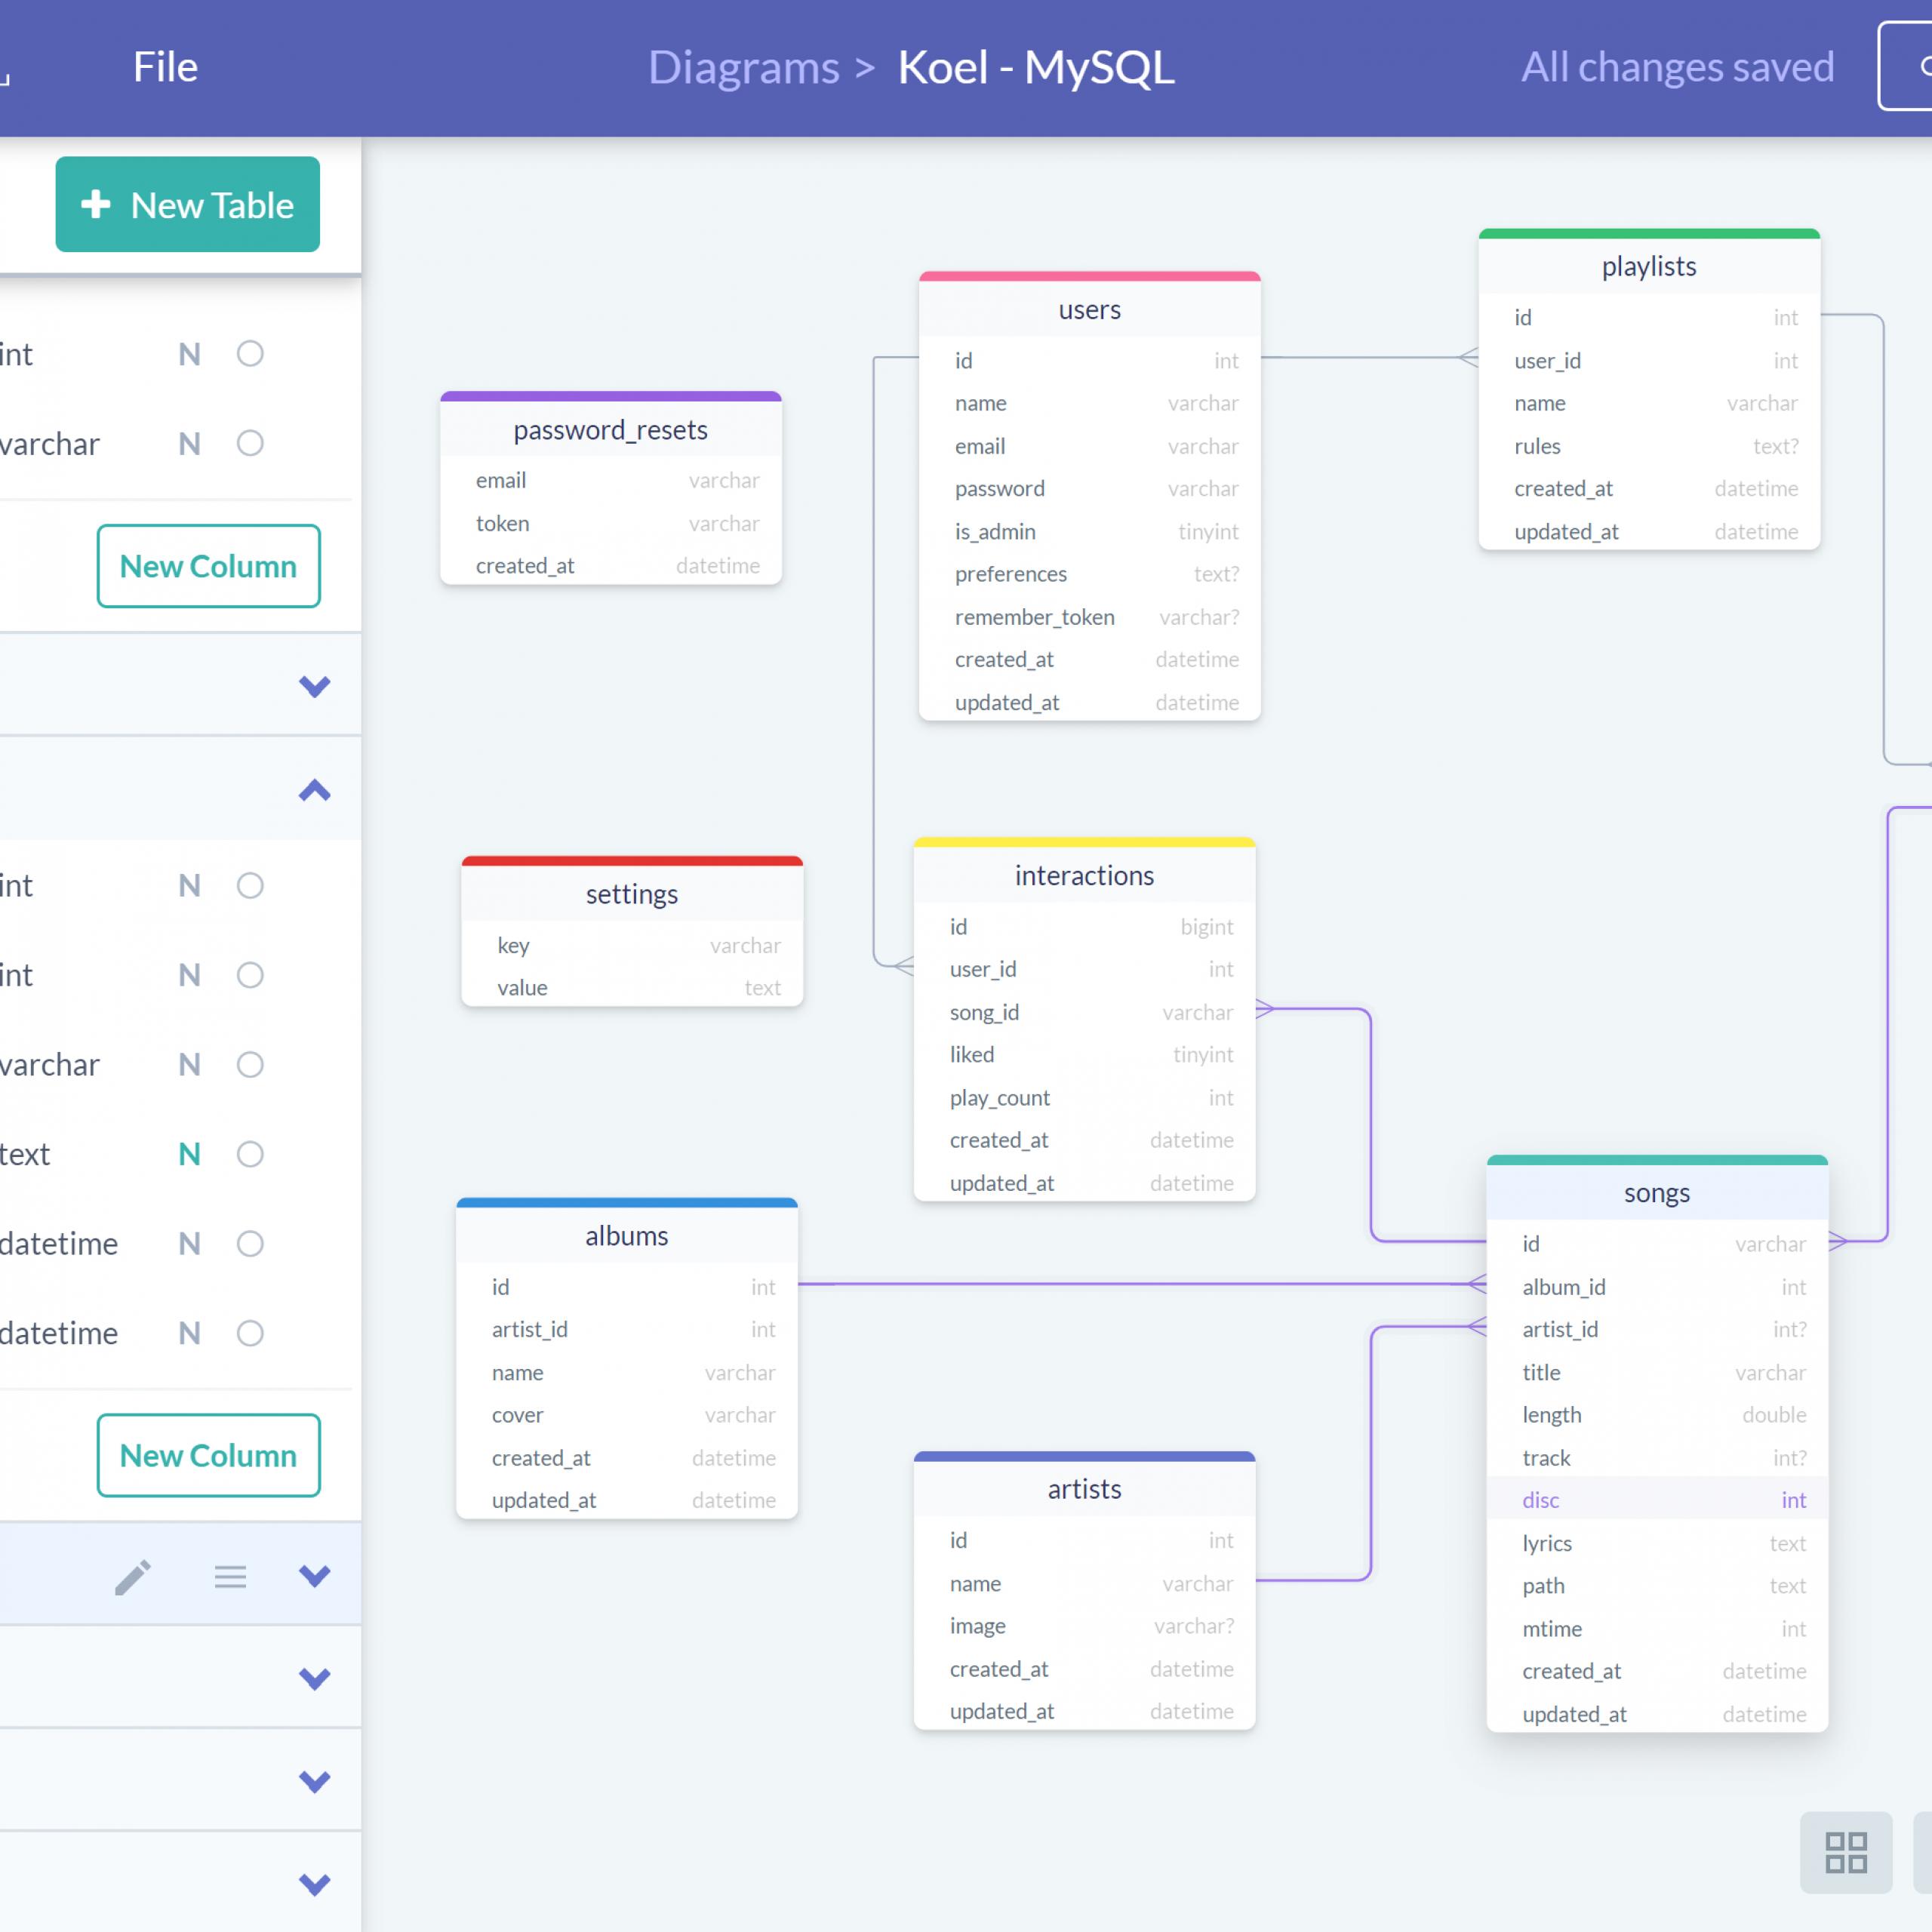 Drawsql - 🔥 Database Schema Diagrams with regard to Relation Diagram Tool